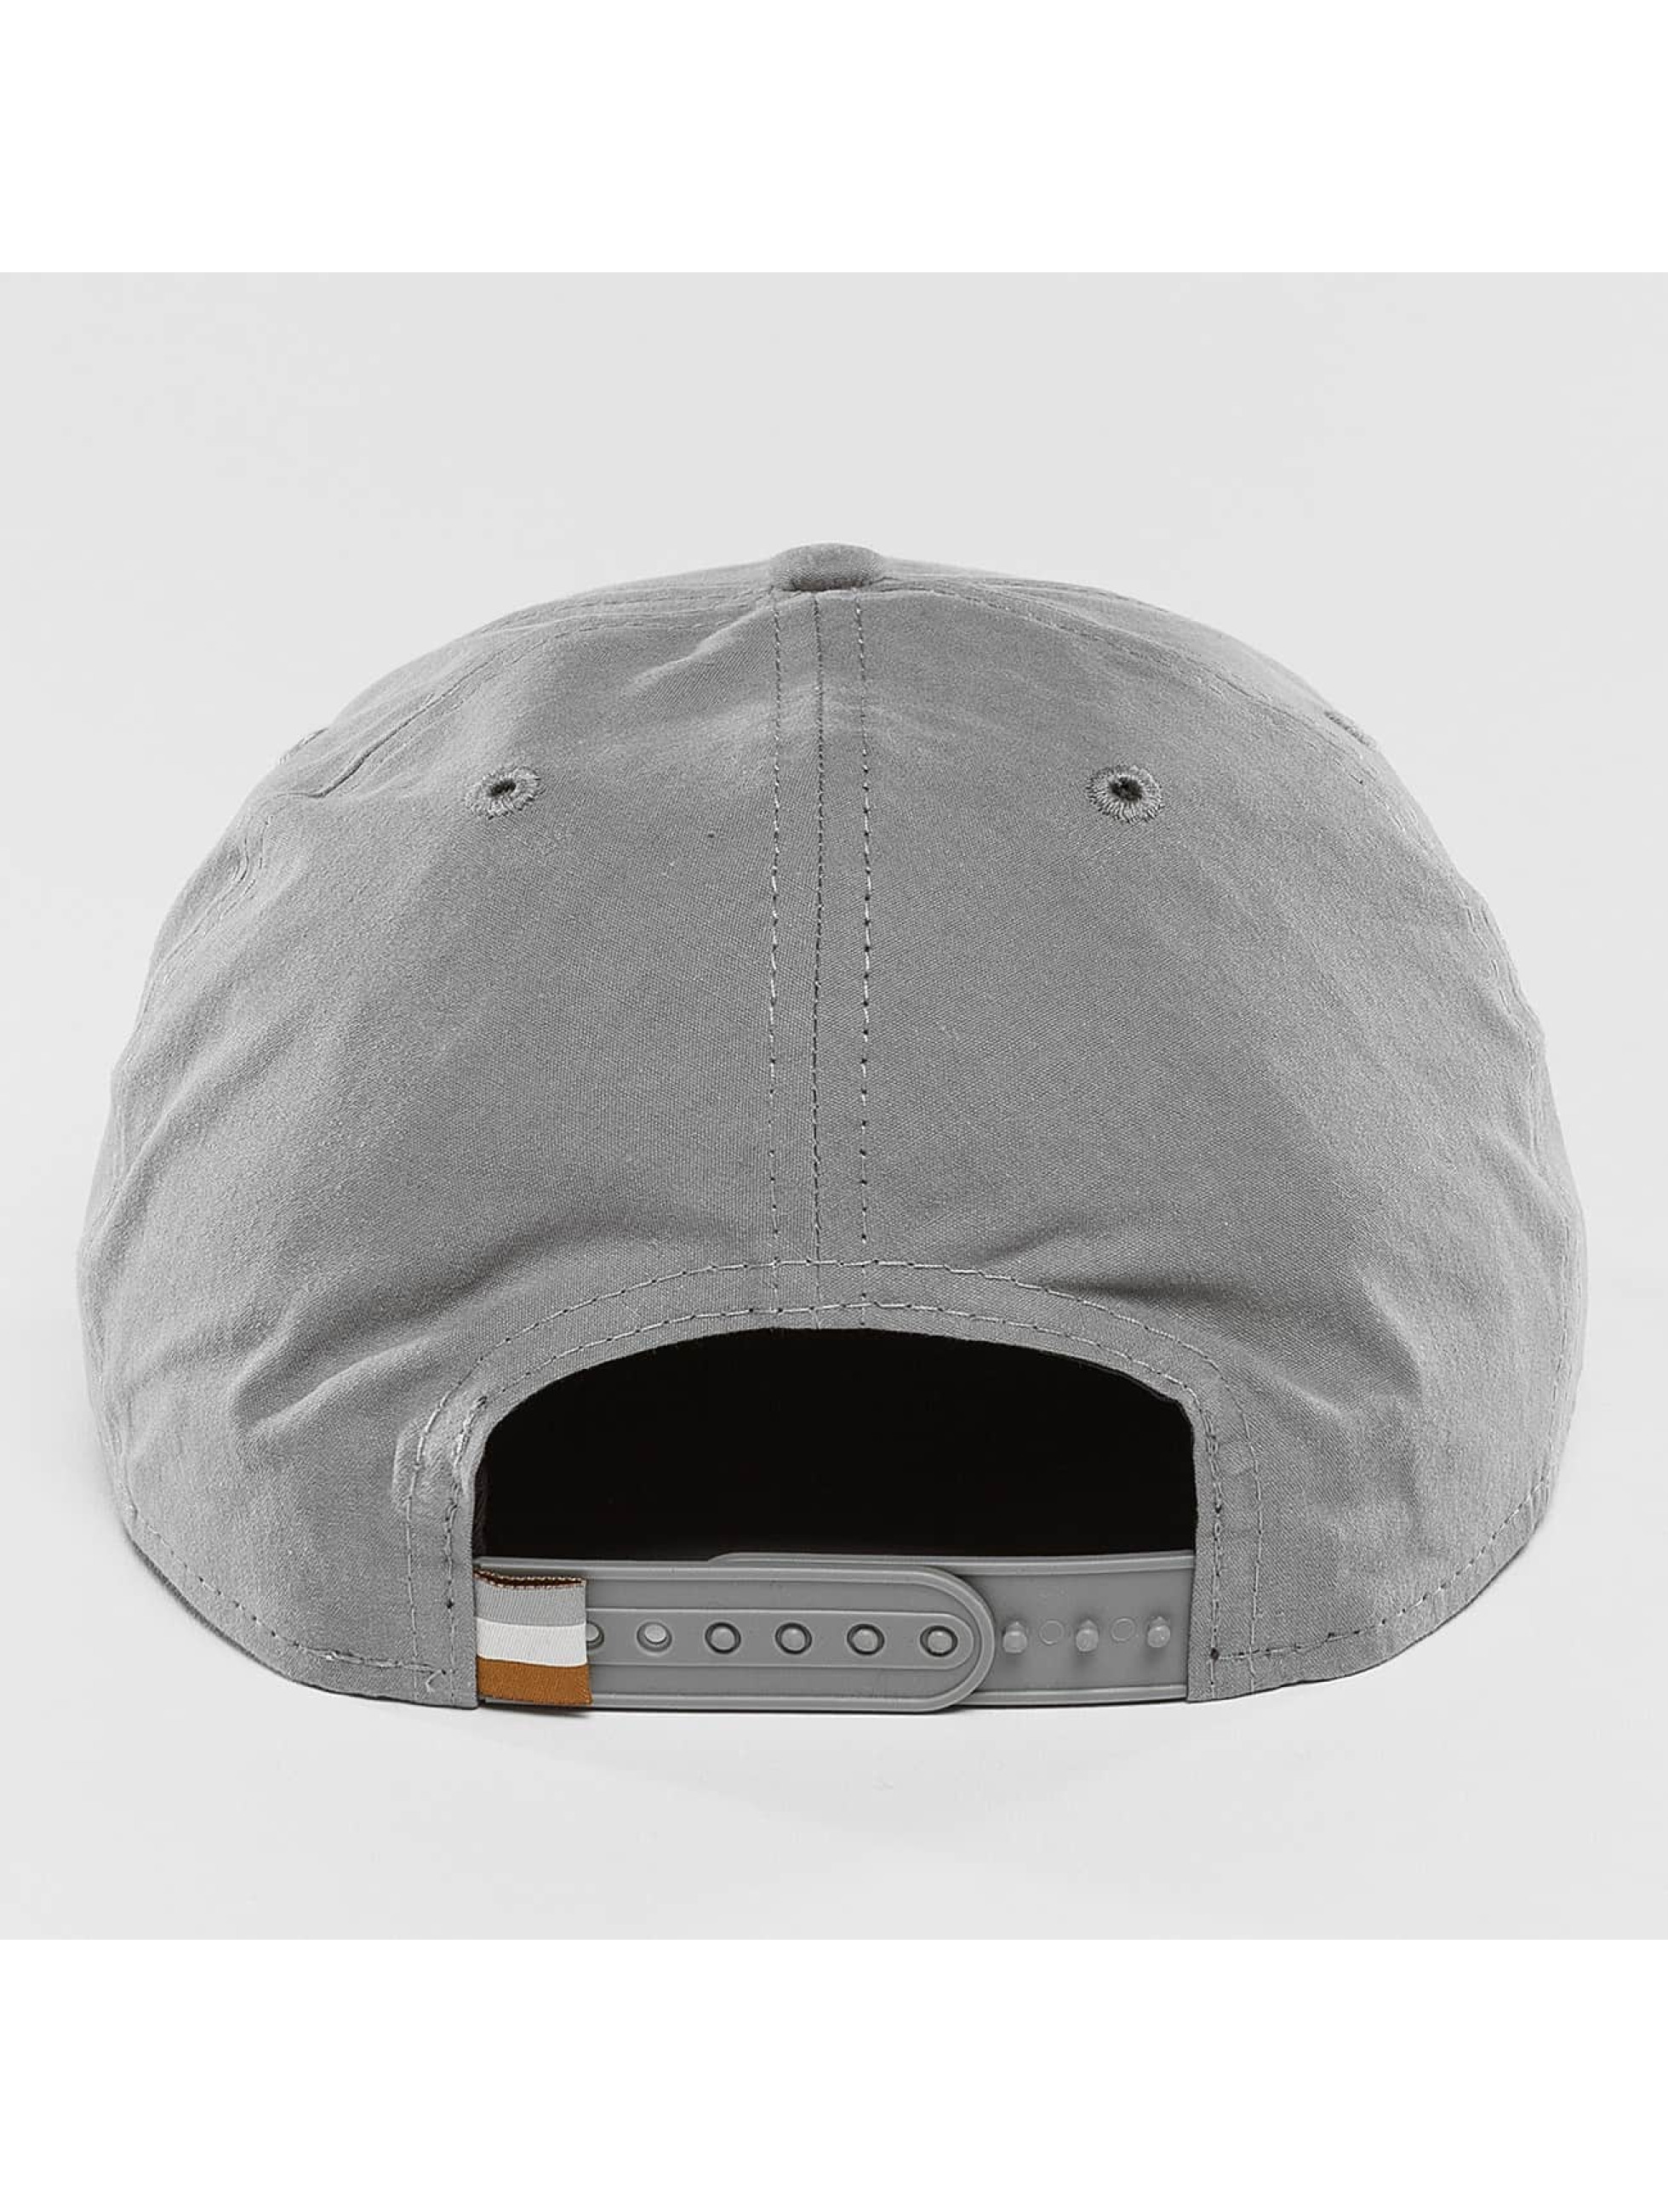 New Era Snapback Cap Lightweight Essential Philadelphia Phillies Cooperstown 9Fifty gray